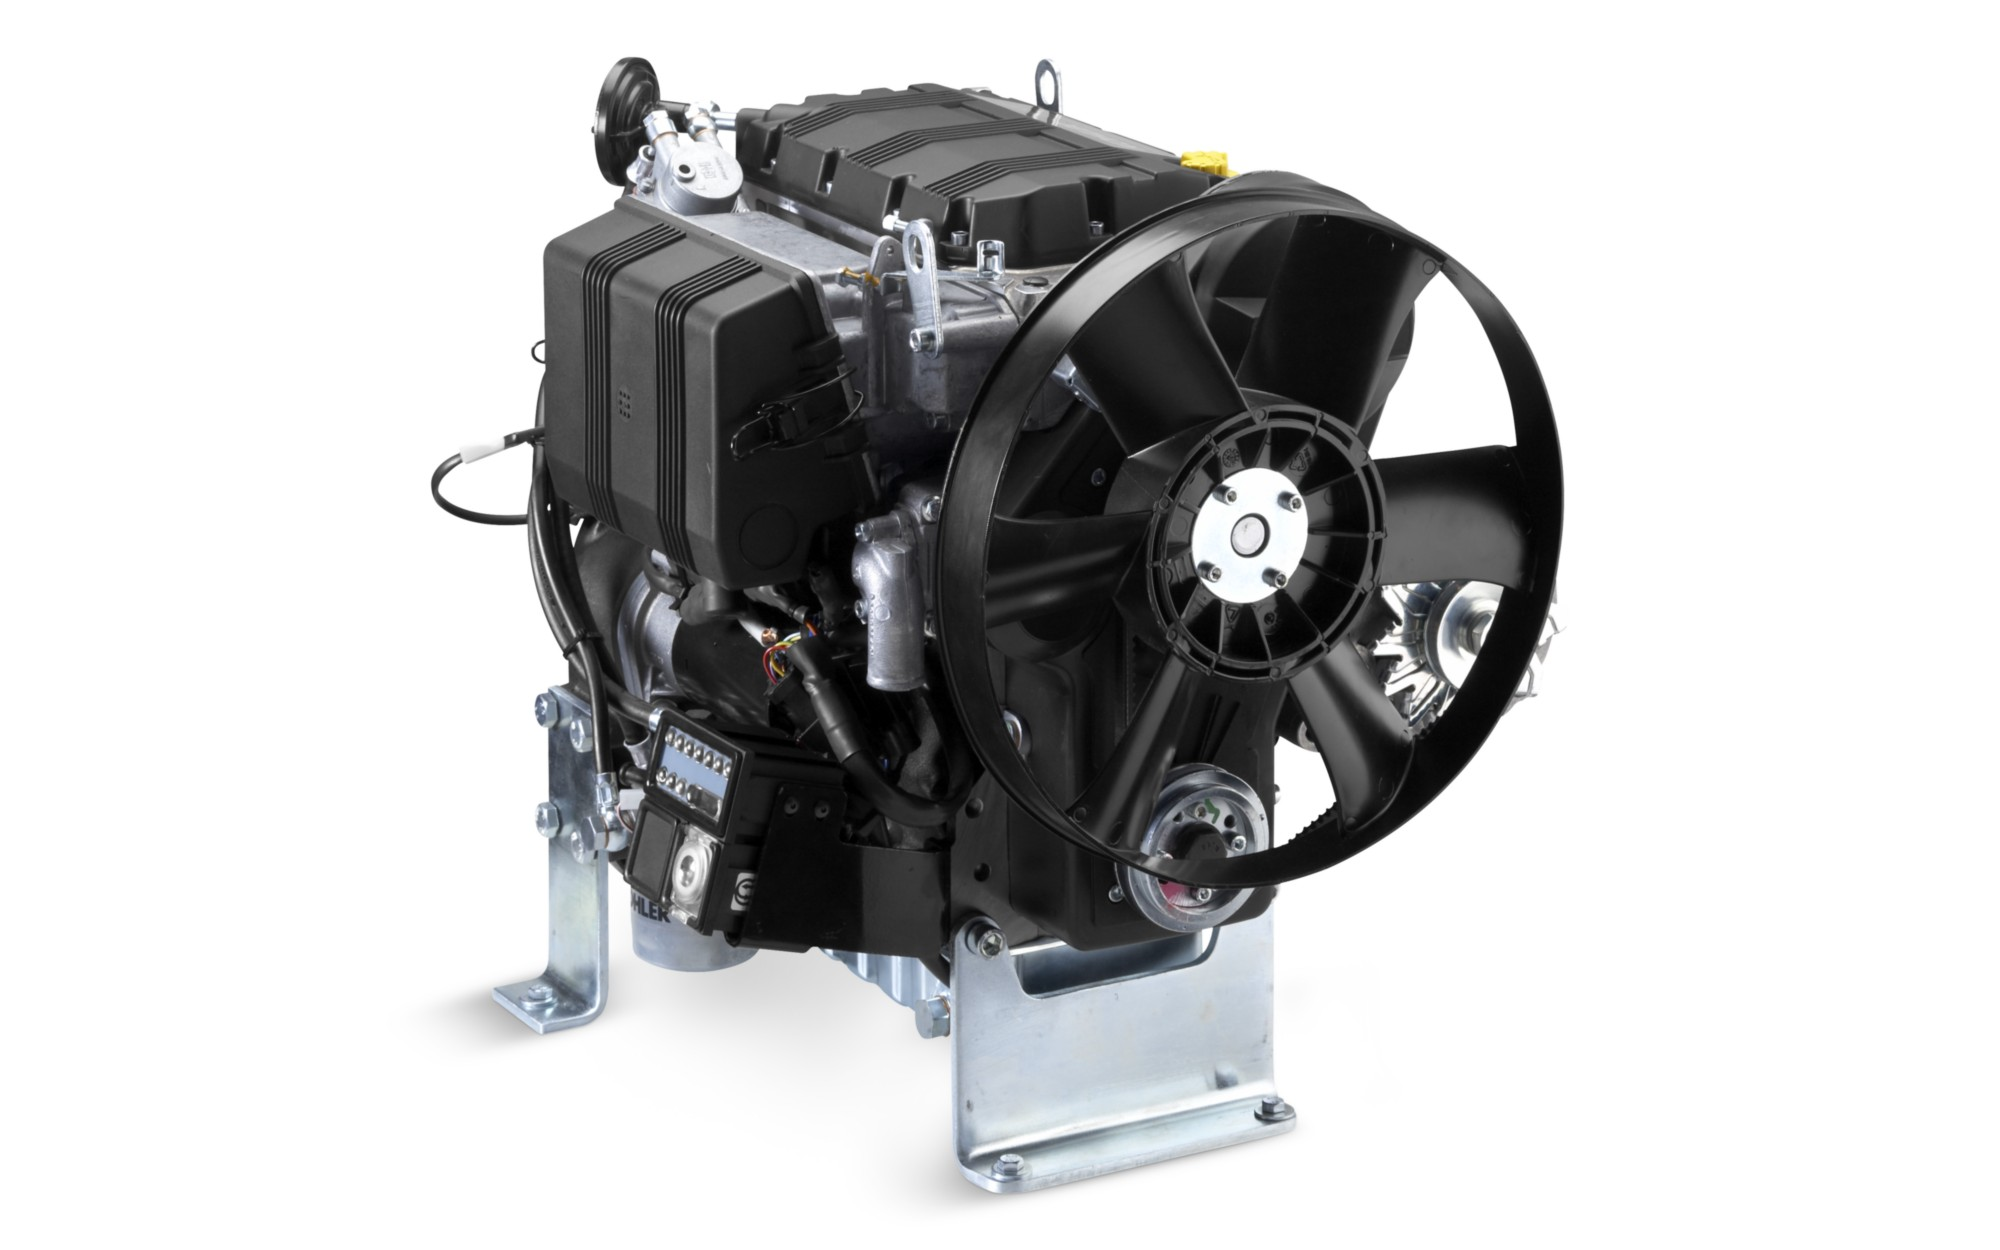 Kdw1003 Diesel Liquid Cooled Kohler Engine Parts Diagram